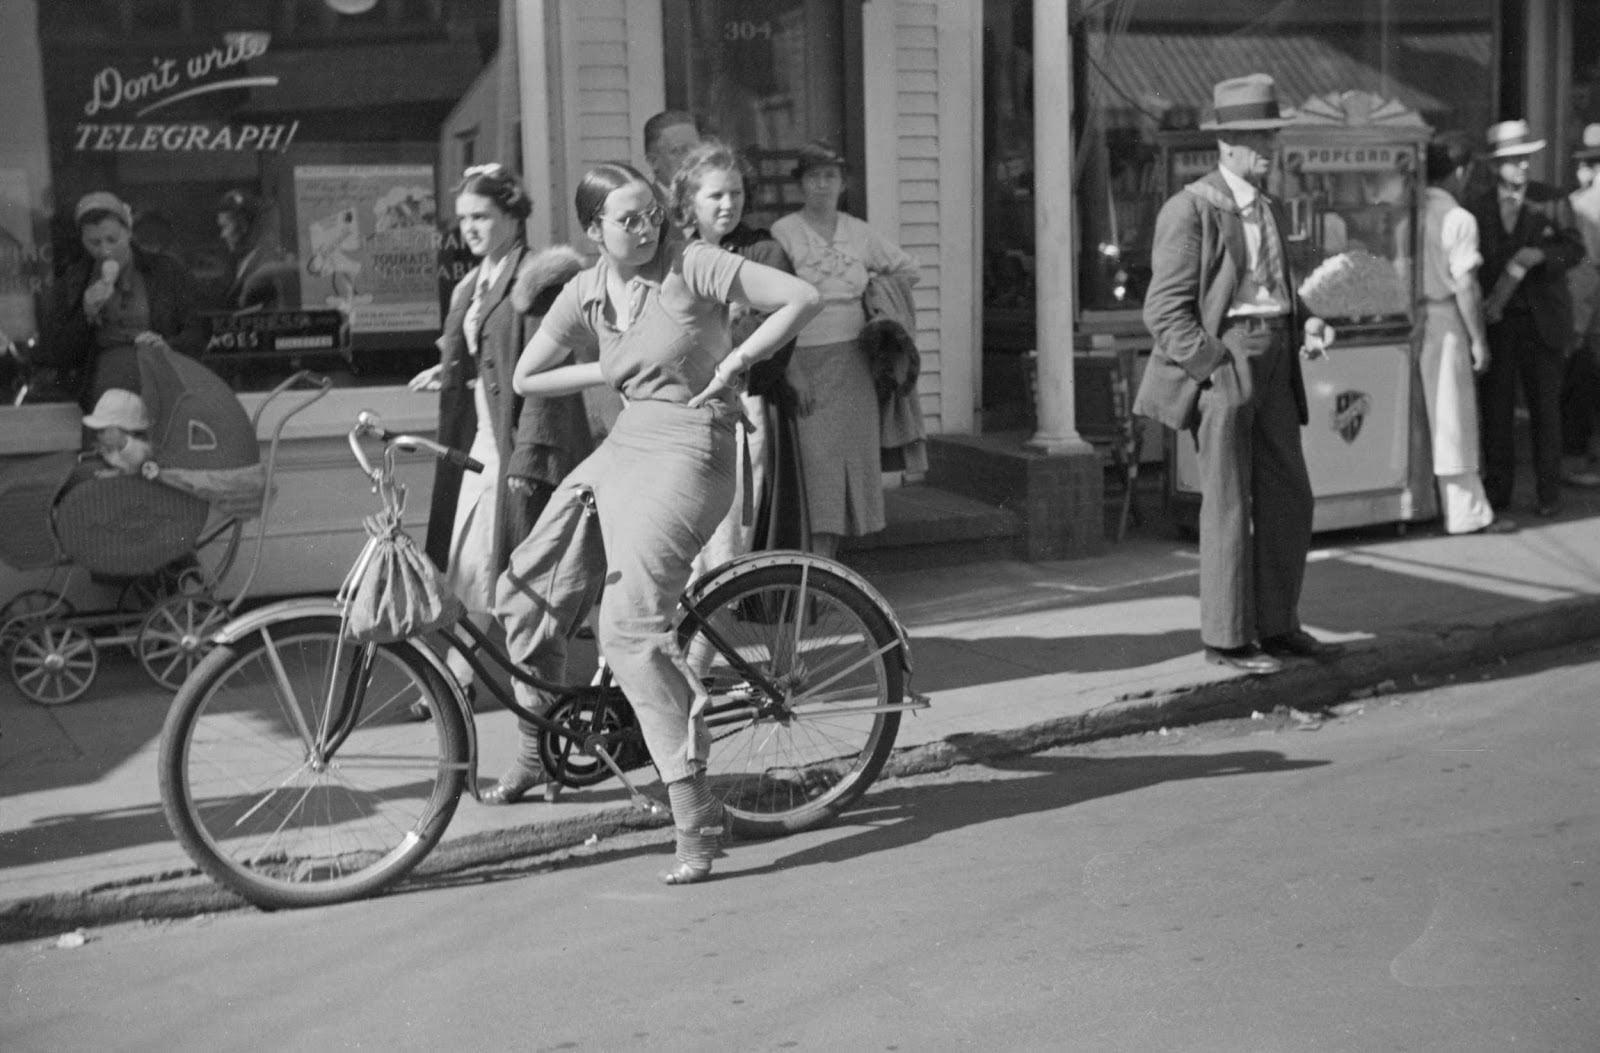 street-scene-provincetown-massachusetts-1937